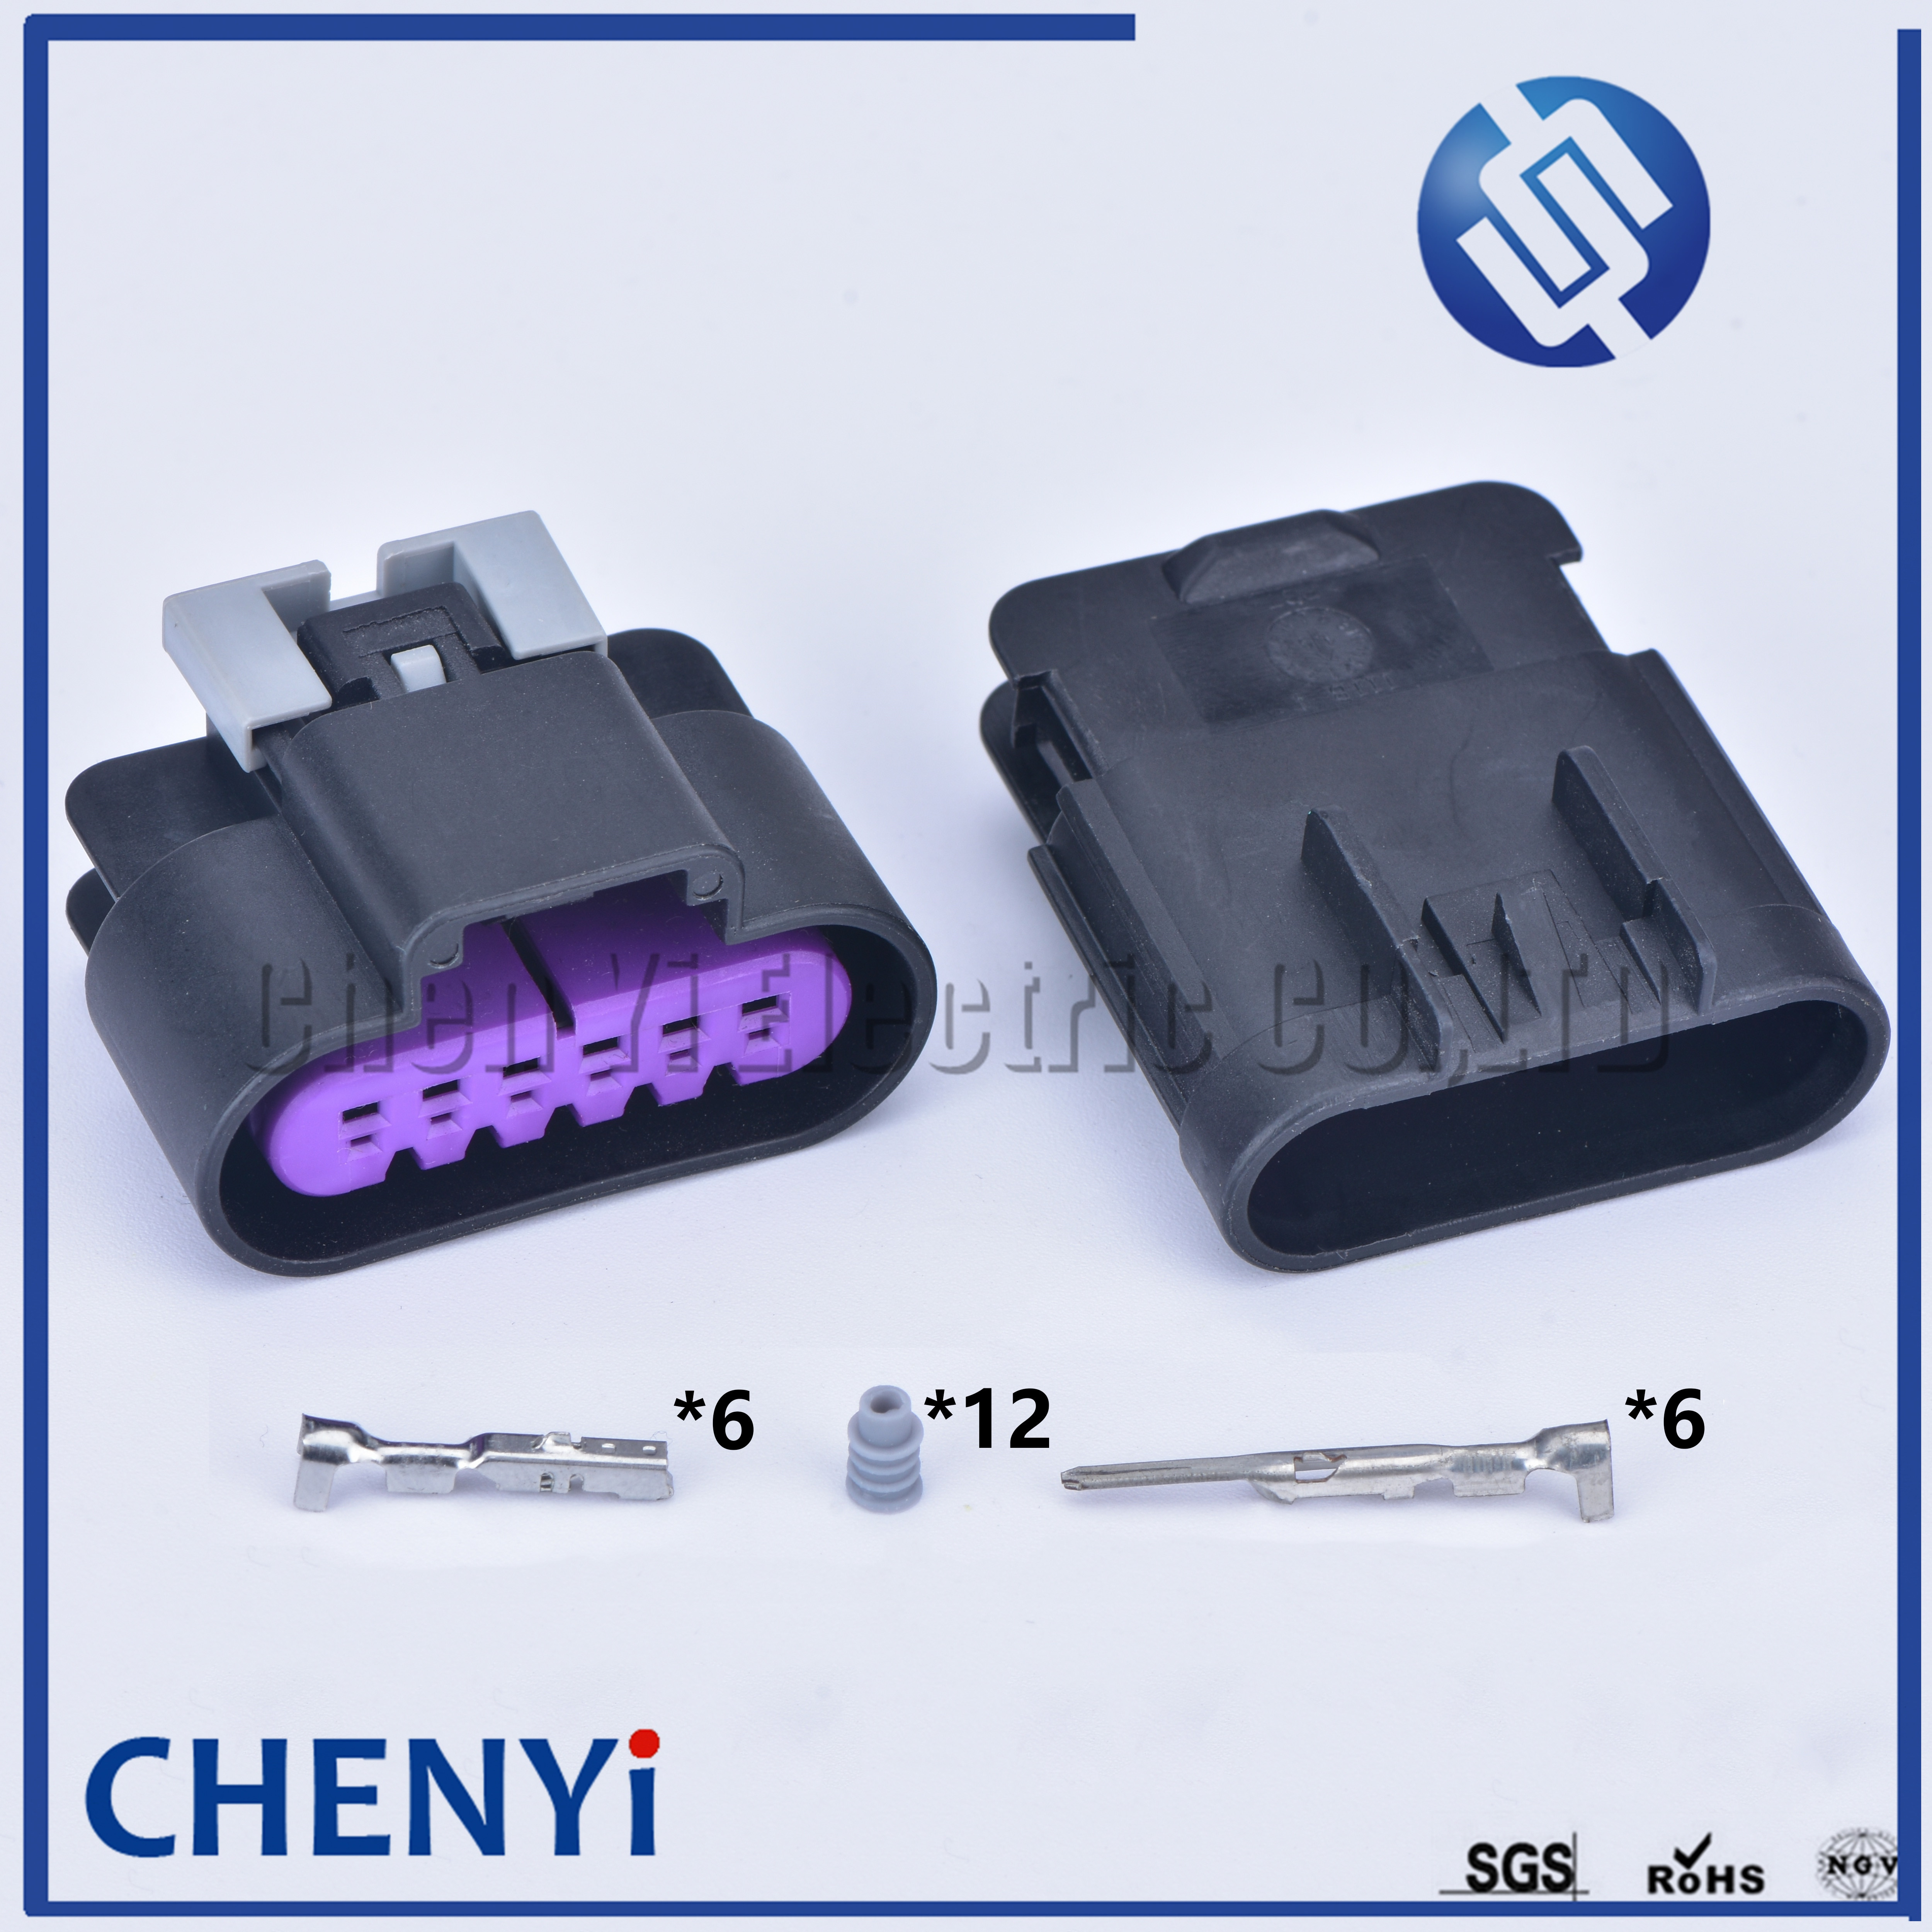 1set 6 Pin 1,5 serie 15326829 15397577 Throttle Position Sensor Buchse Gaspedal Position Sensor Stecker Für LS3 LS7 CTS-V